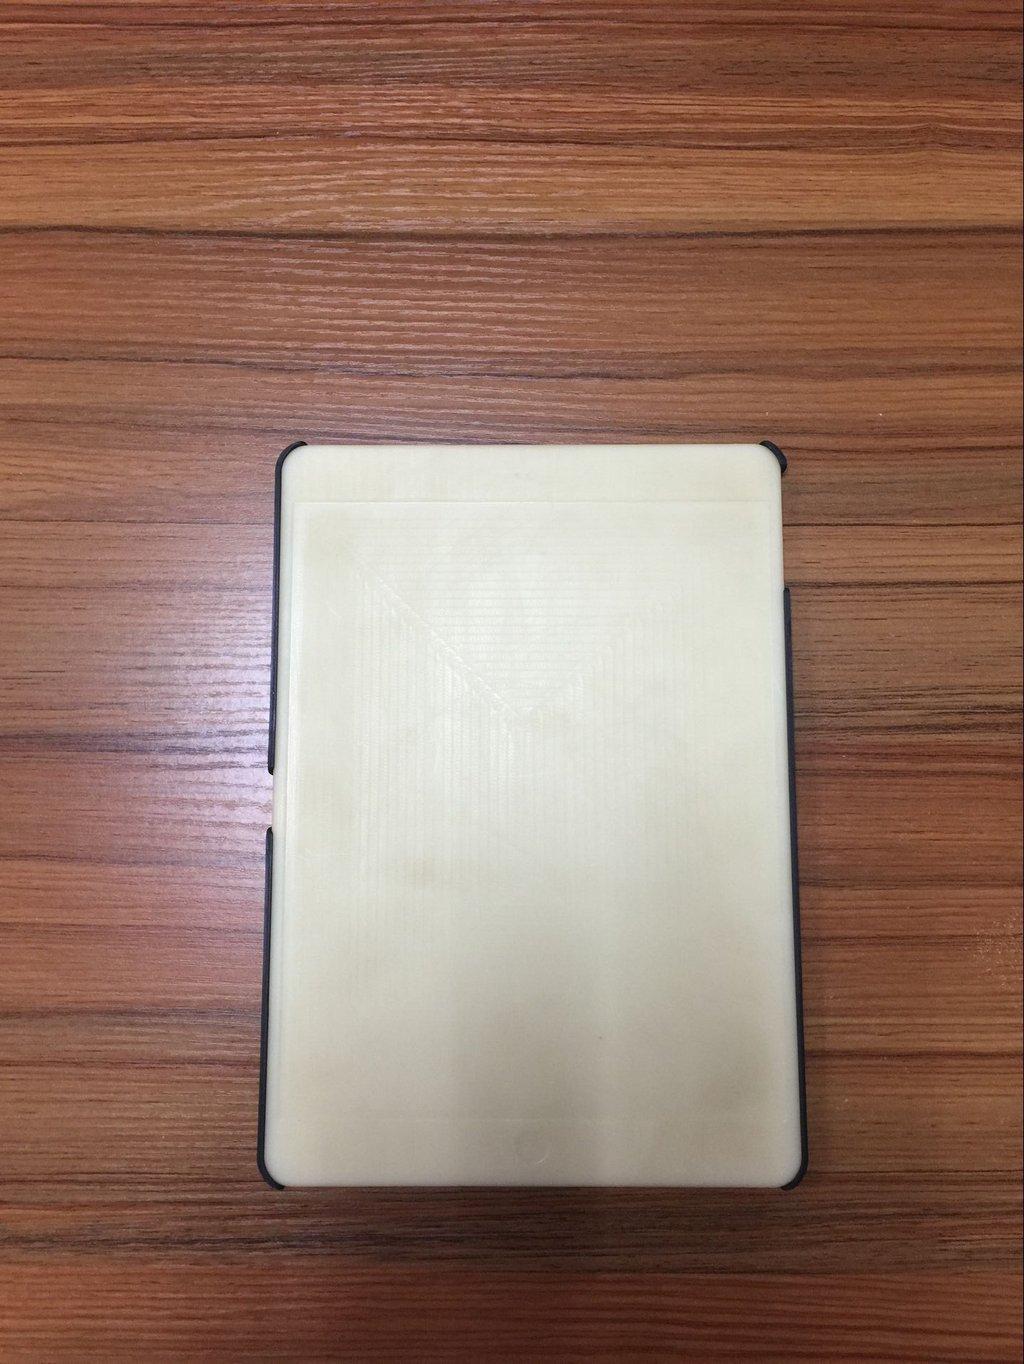 carcasa iPad Pro 9.7 inch 3